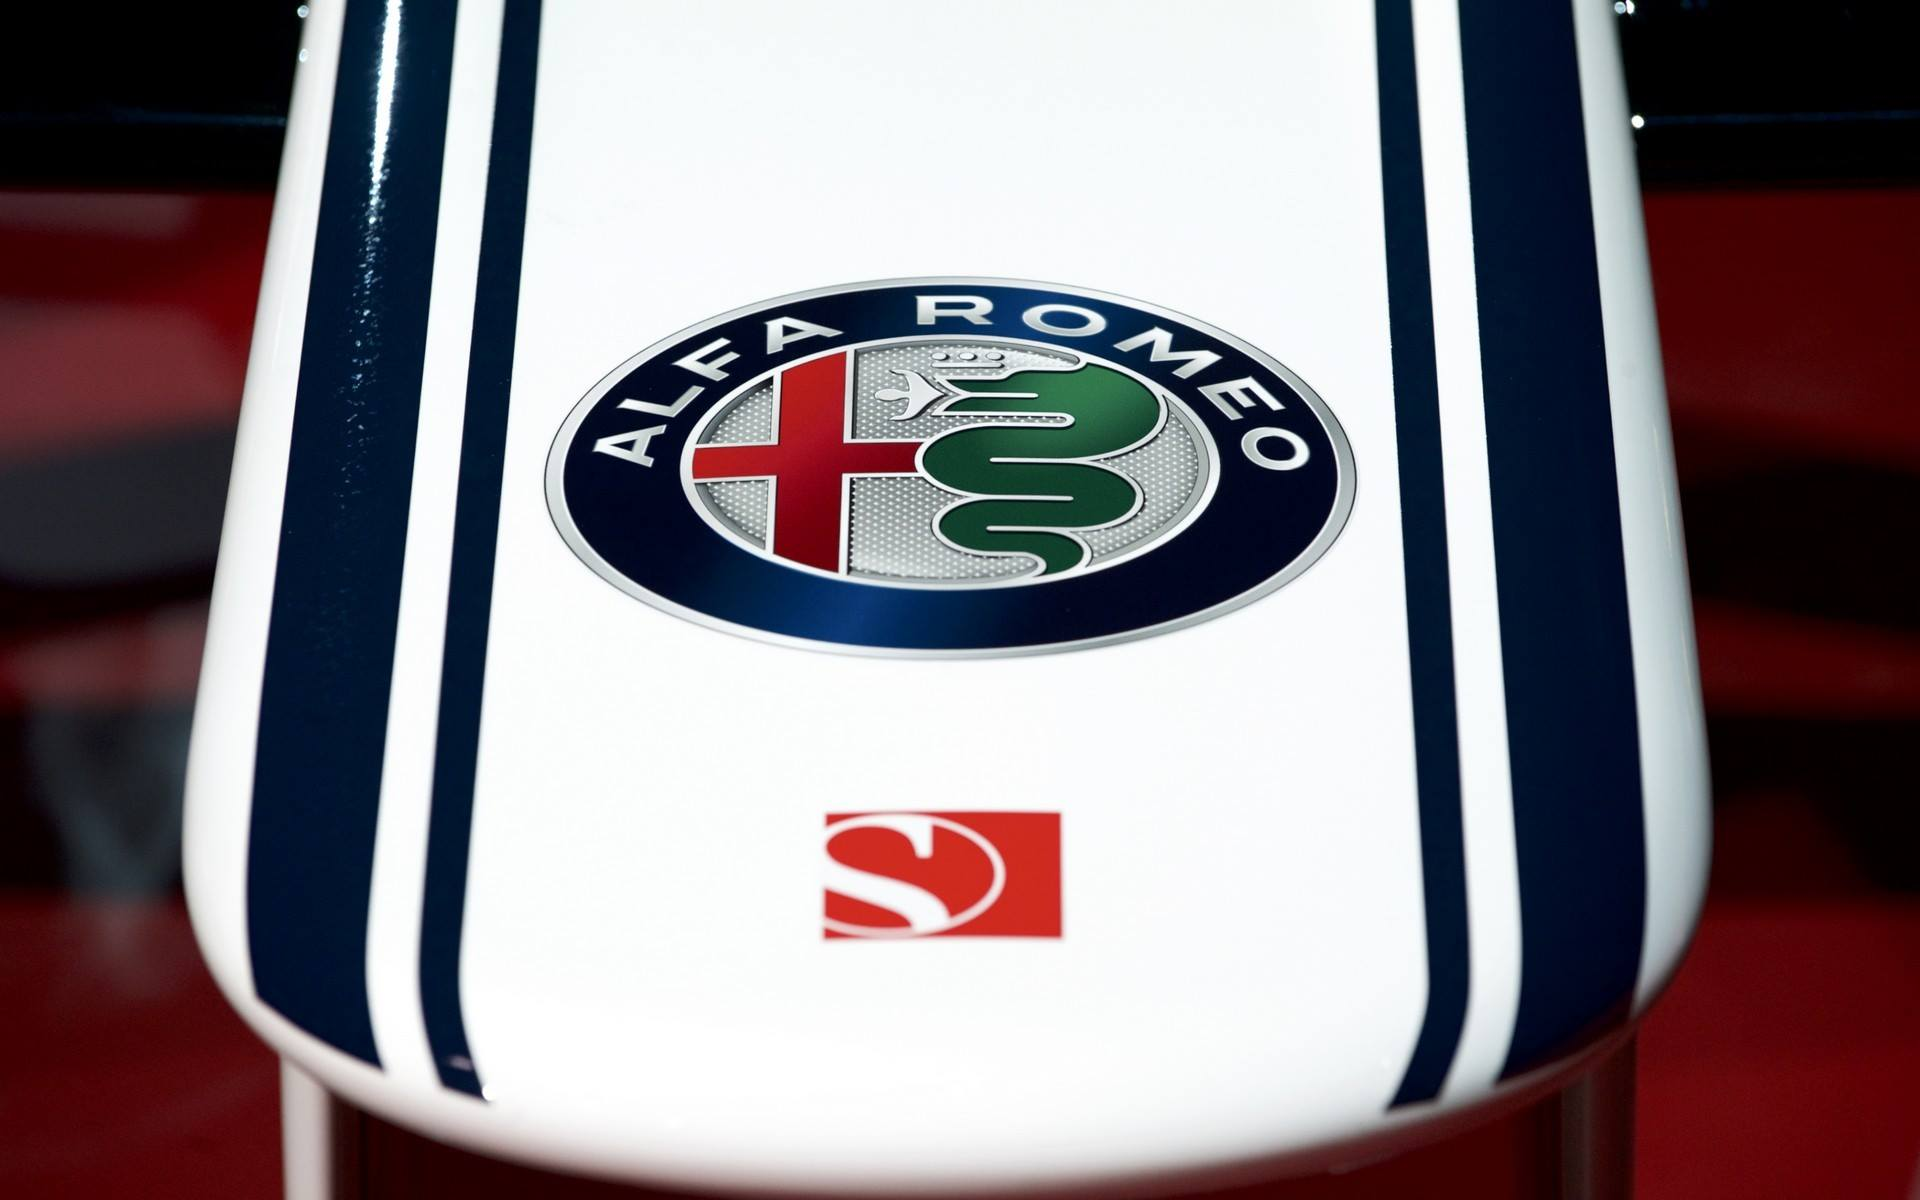 Alfa_Romeo_Sauber_F1_0004